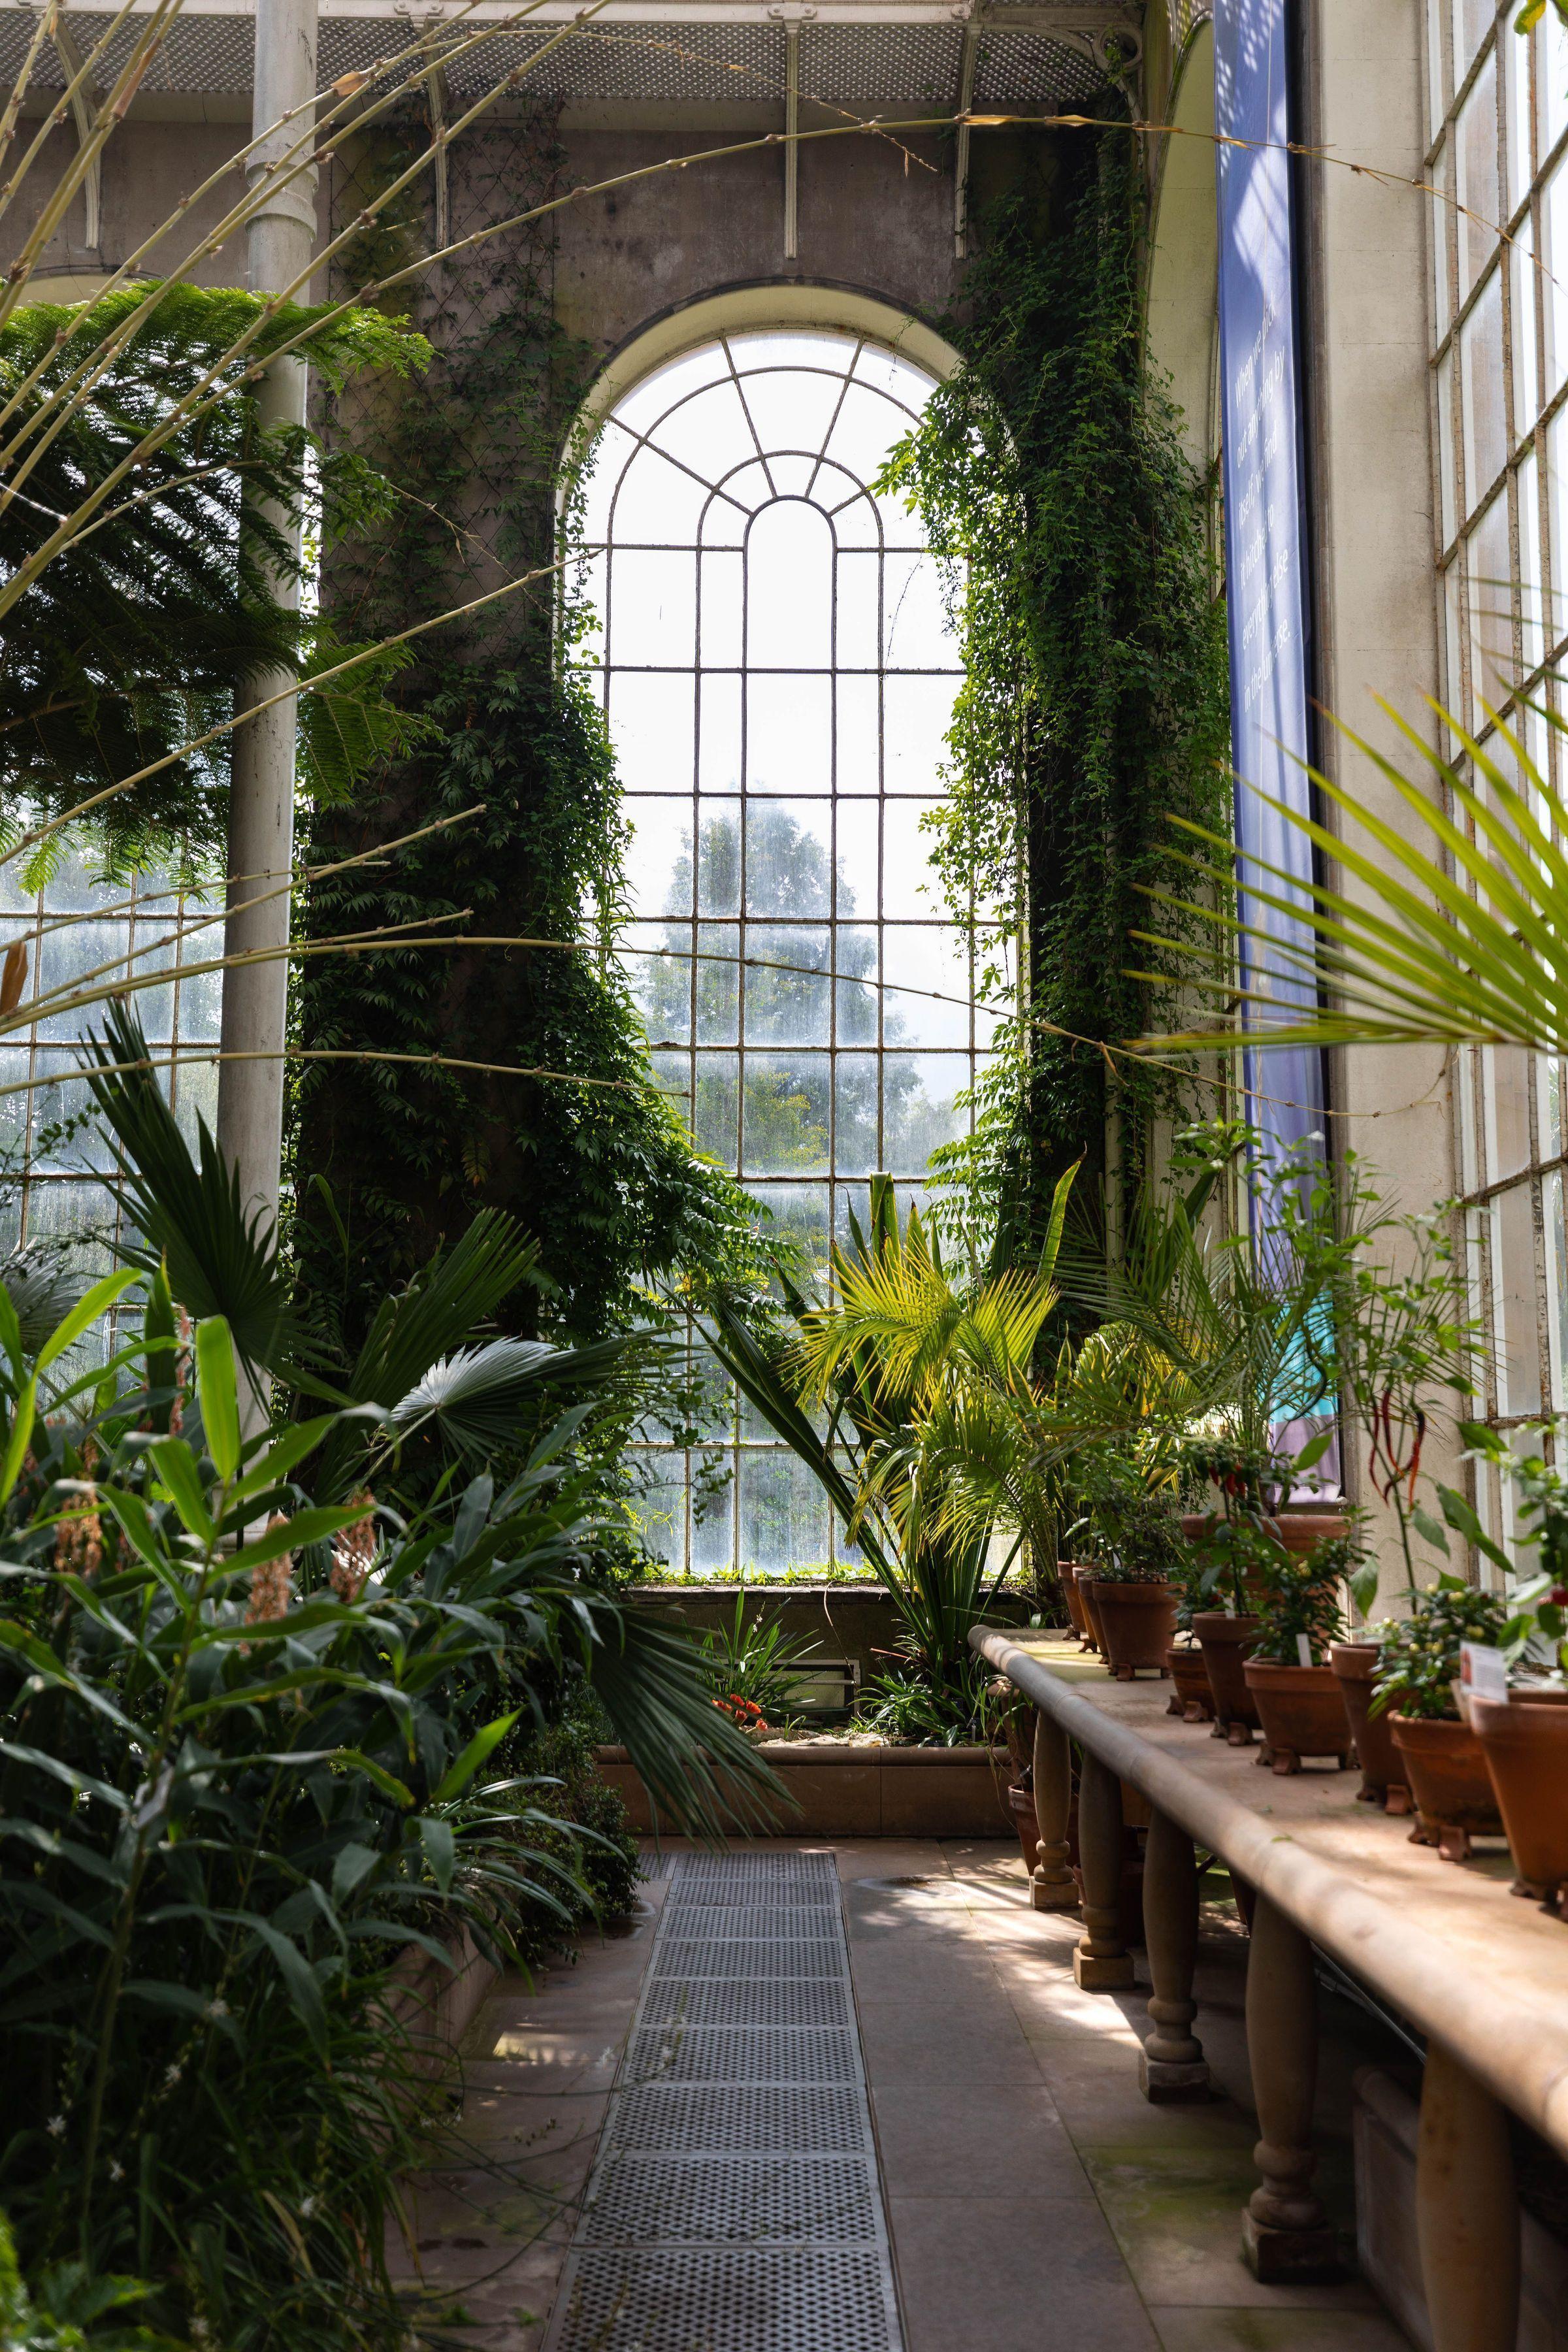 Visiting Royal Botanic Garden Edinburgh Scotland Botanicgarden Temperate Palm House Glasshouse At R Botanic Gardens Edinburgh Botanical Gardens Garden Design